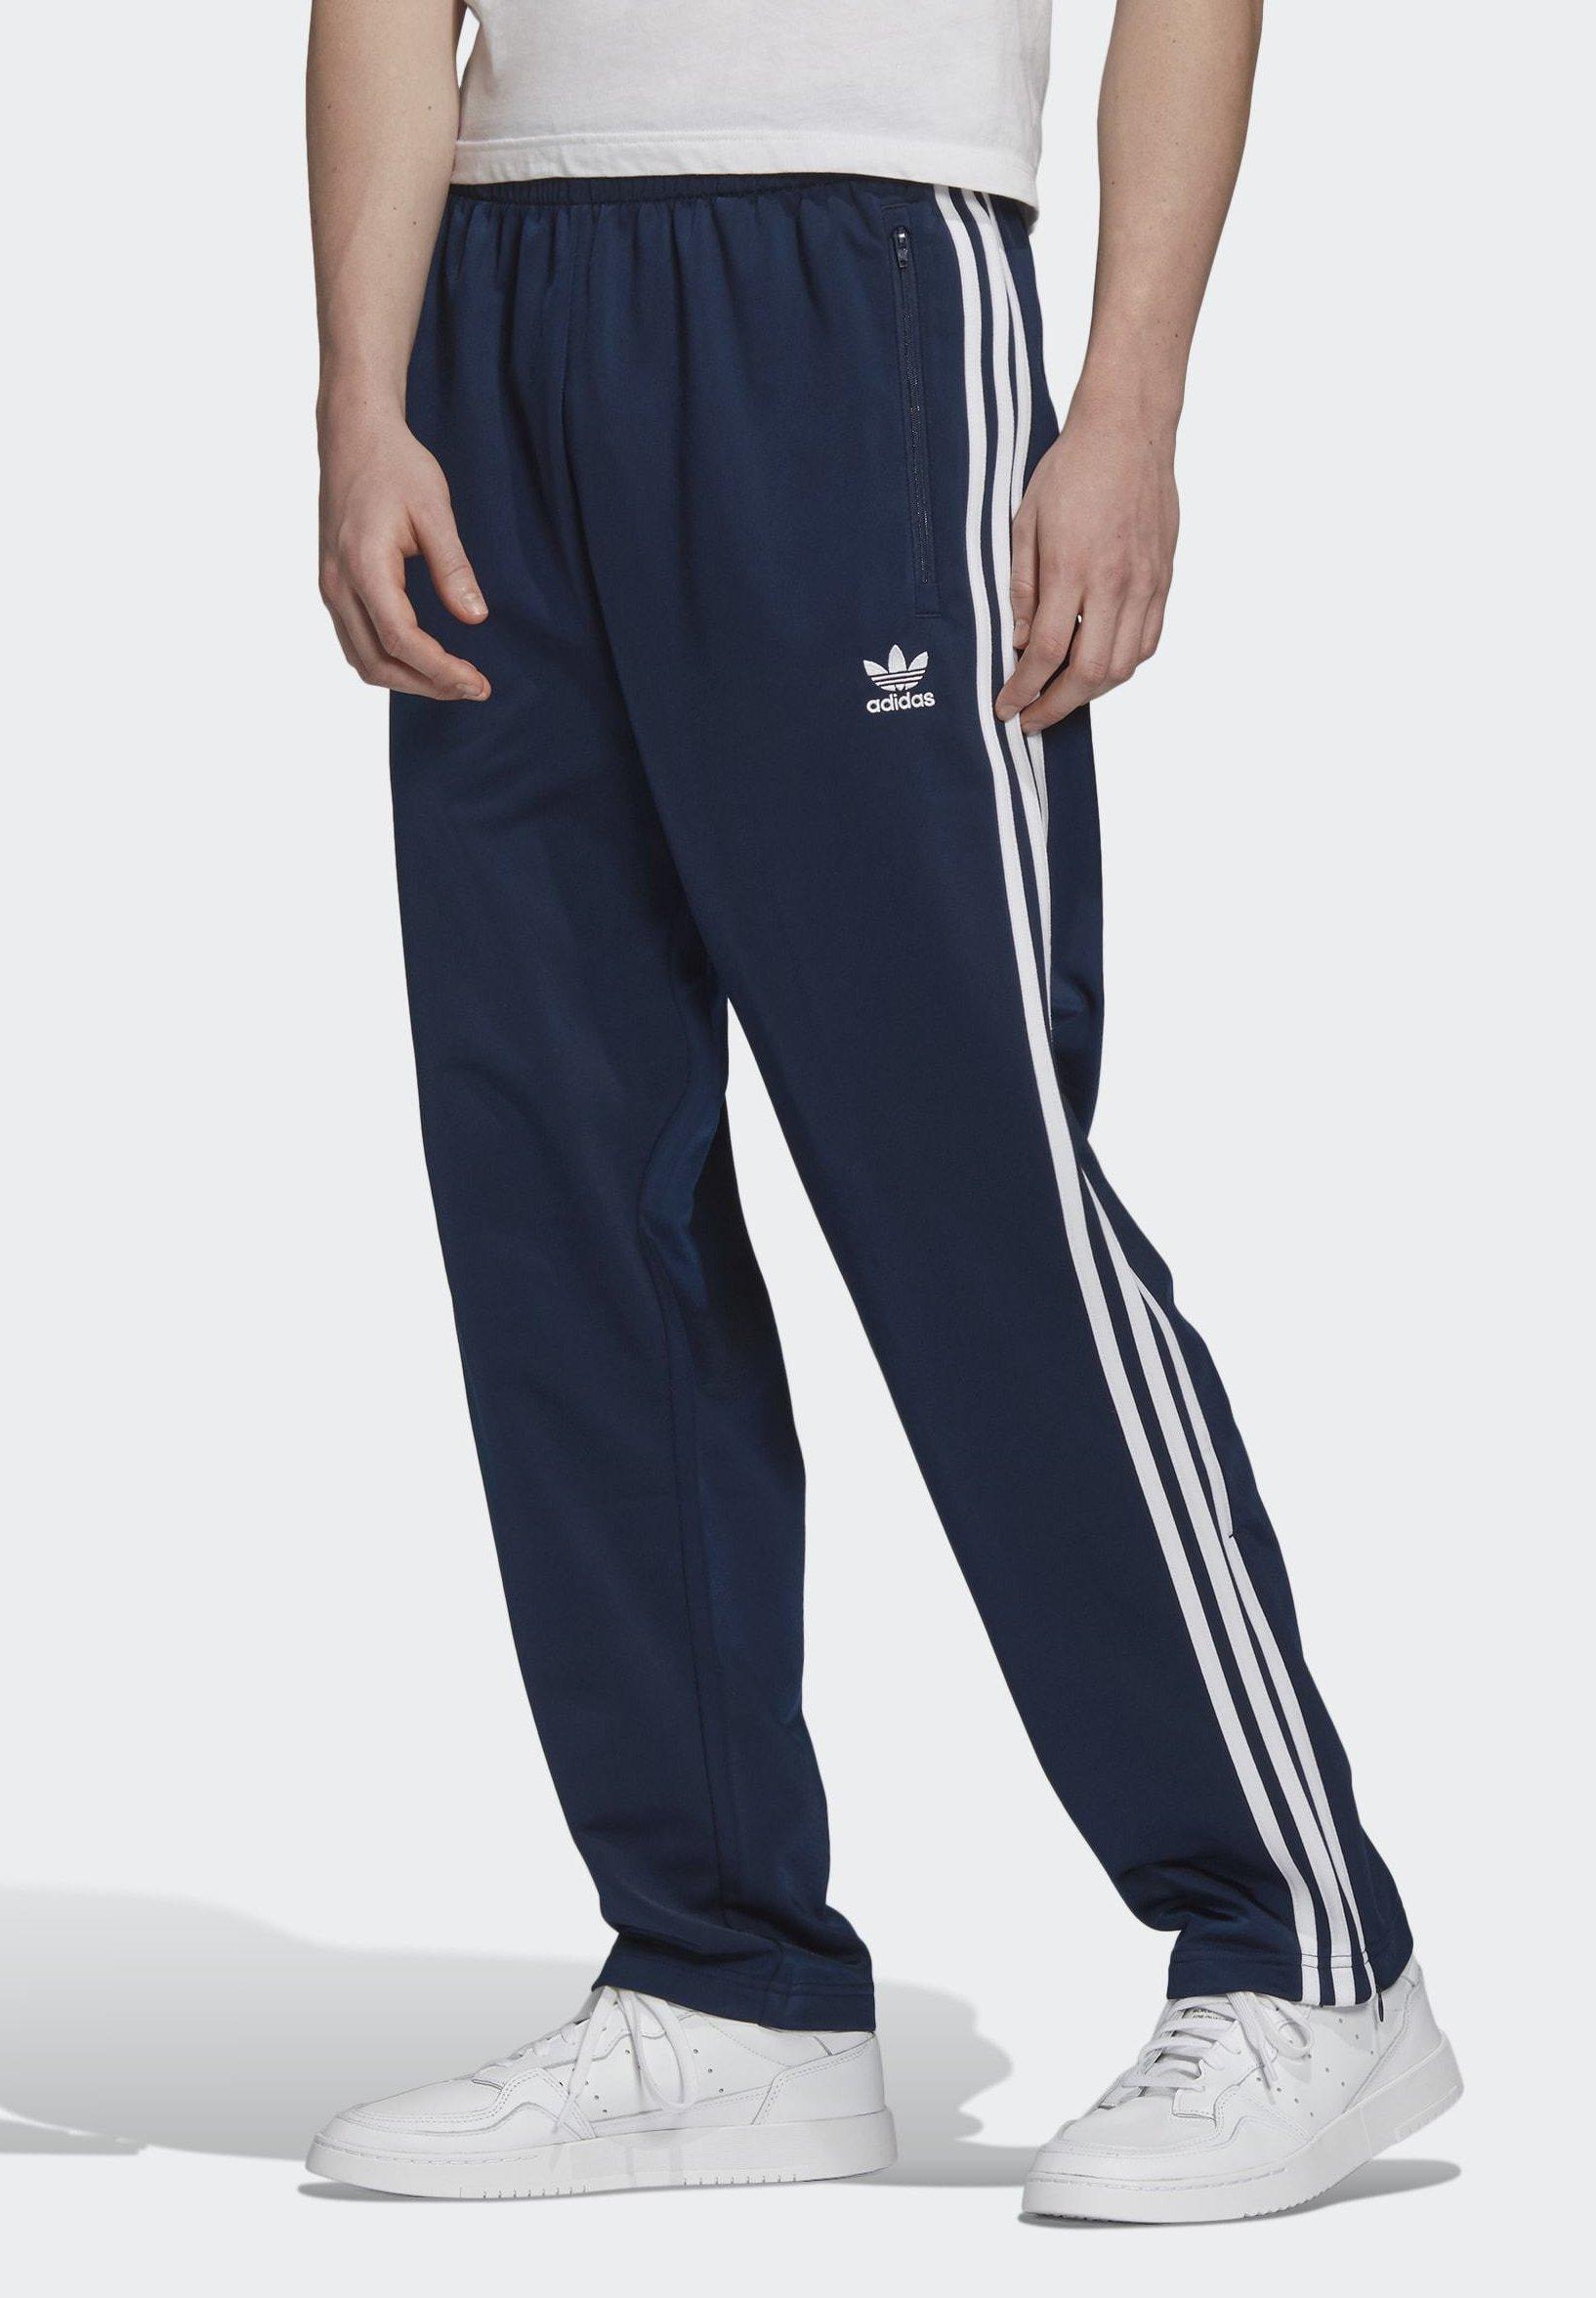 adidas originals jogging bottoms